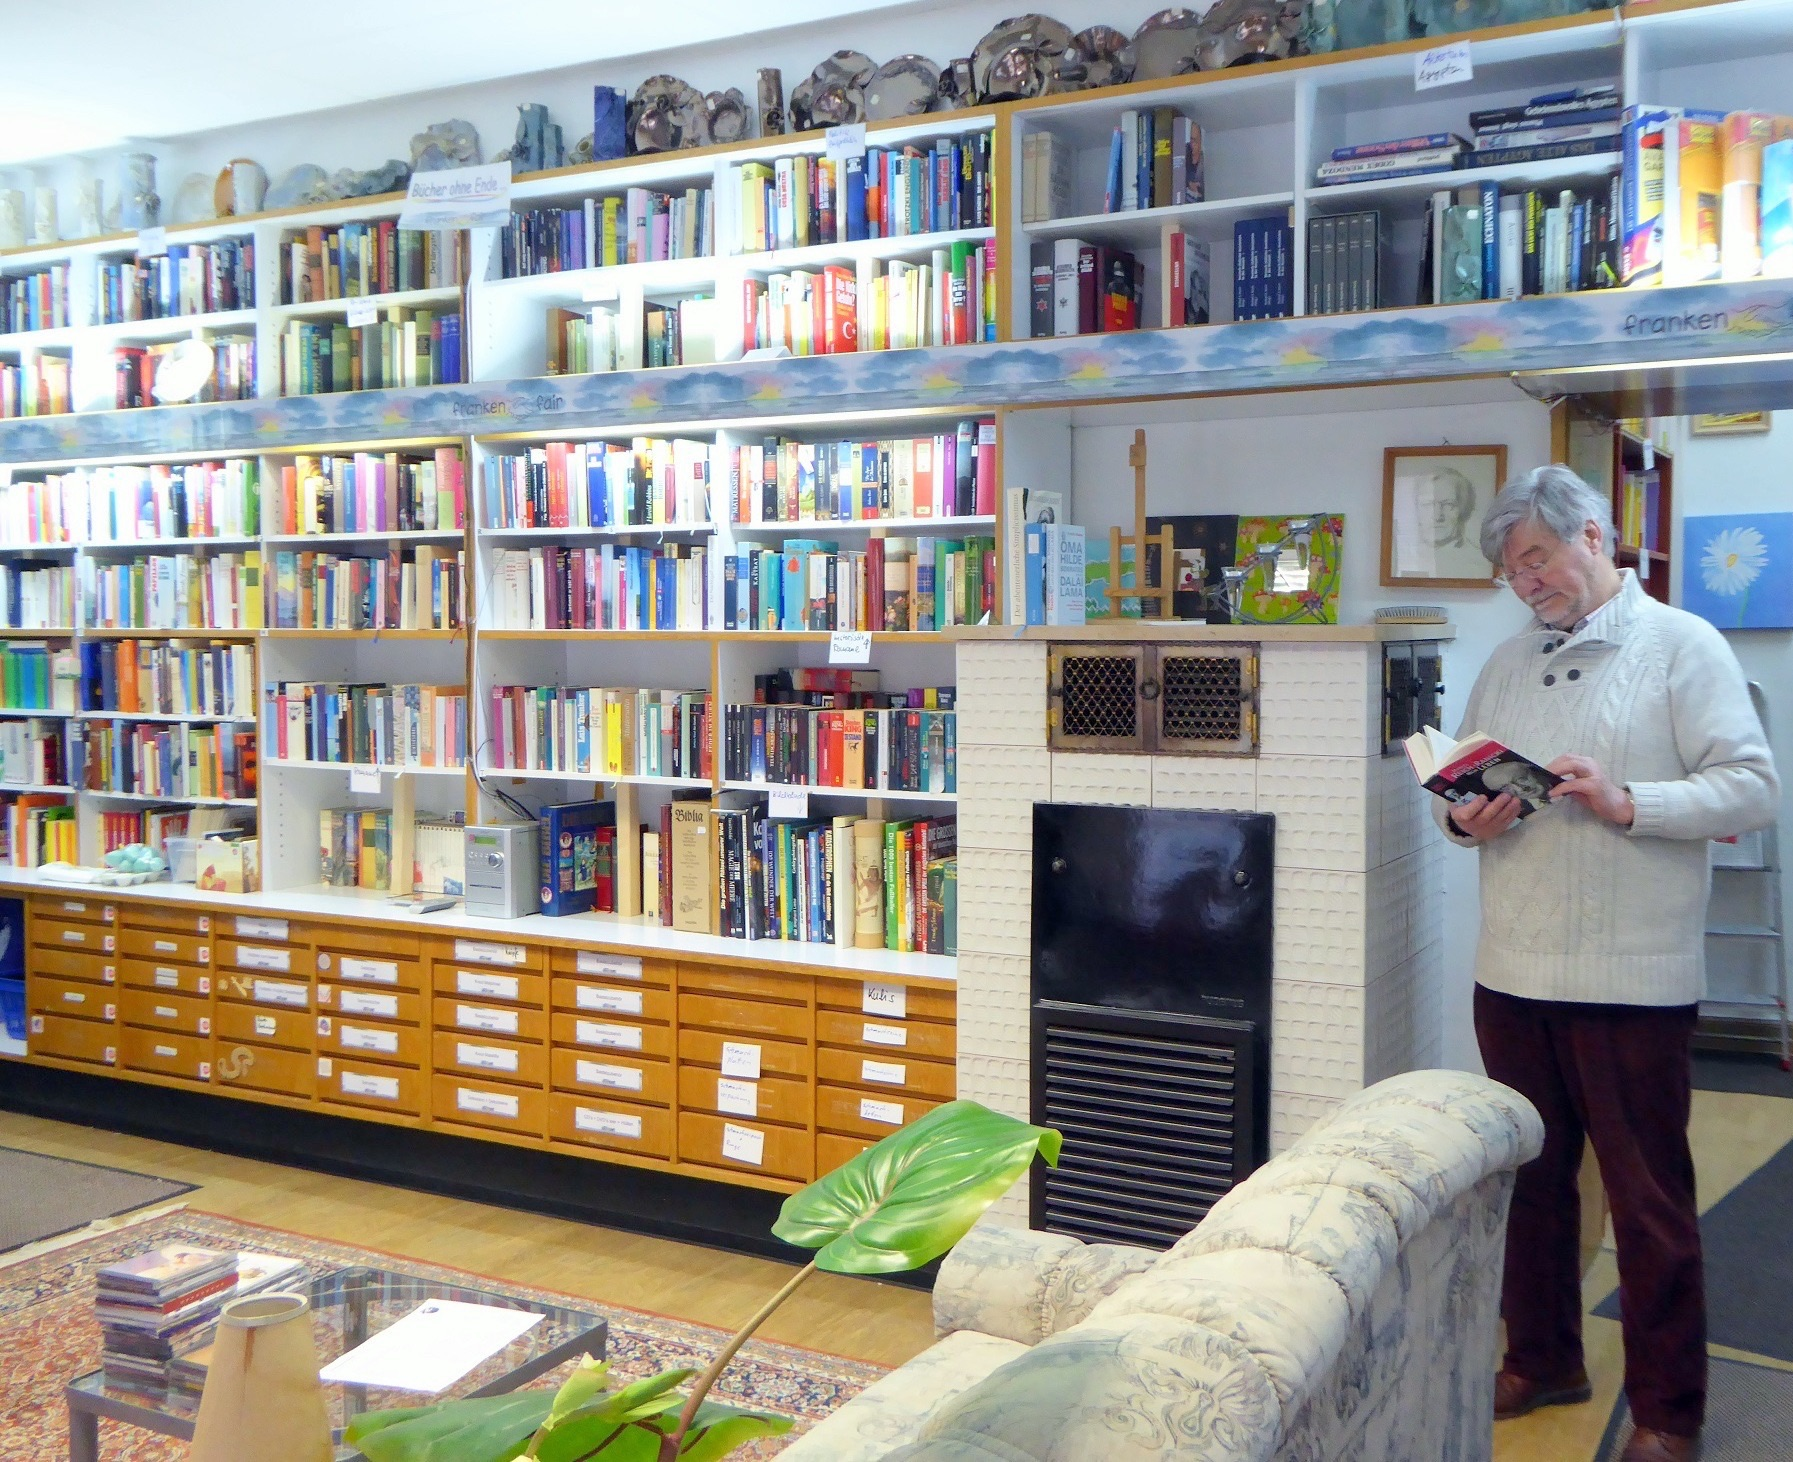 Frankenfair - Sozialer Buchladen